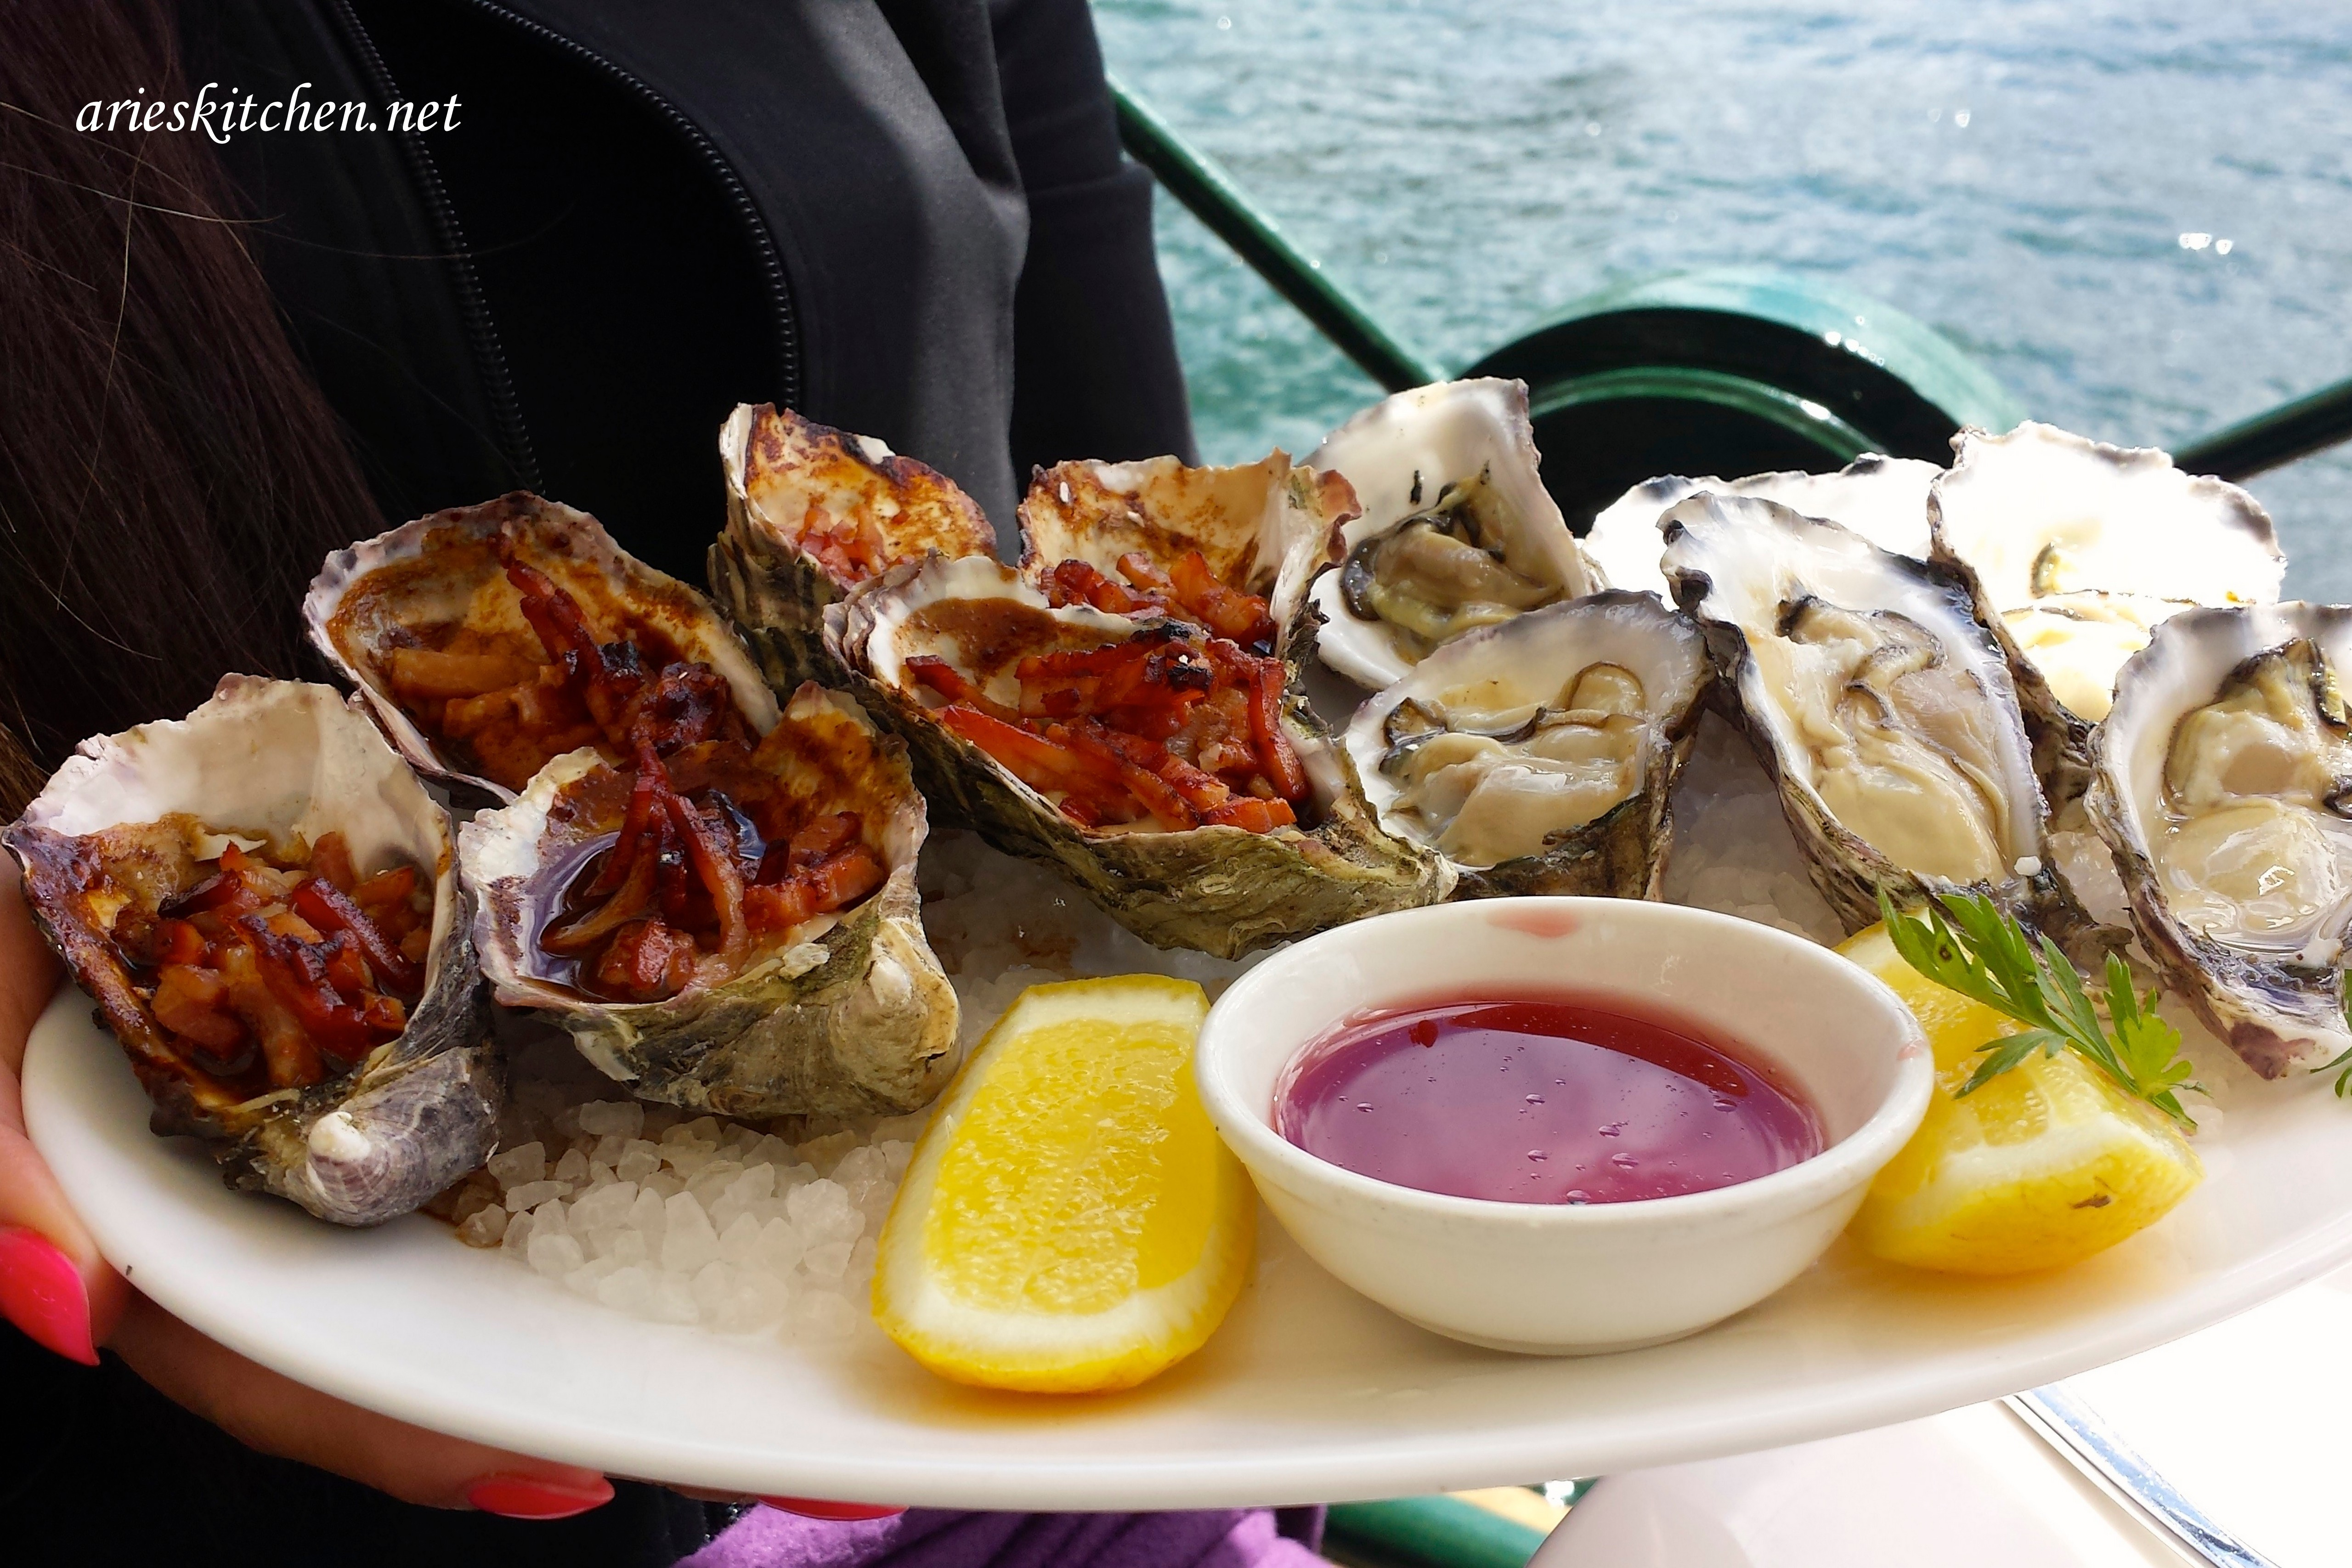 The sydney cove oyster bar sydney day 5 arie 39 s kitchen for Food bar sydney